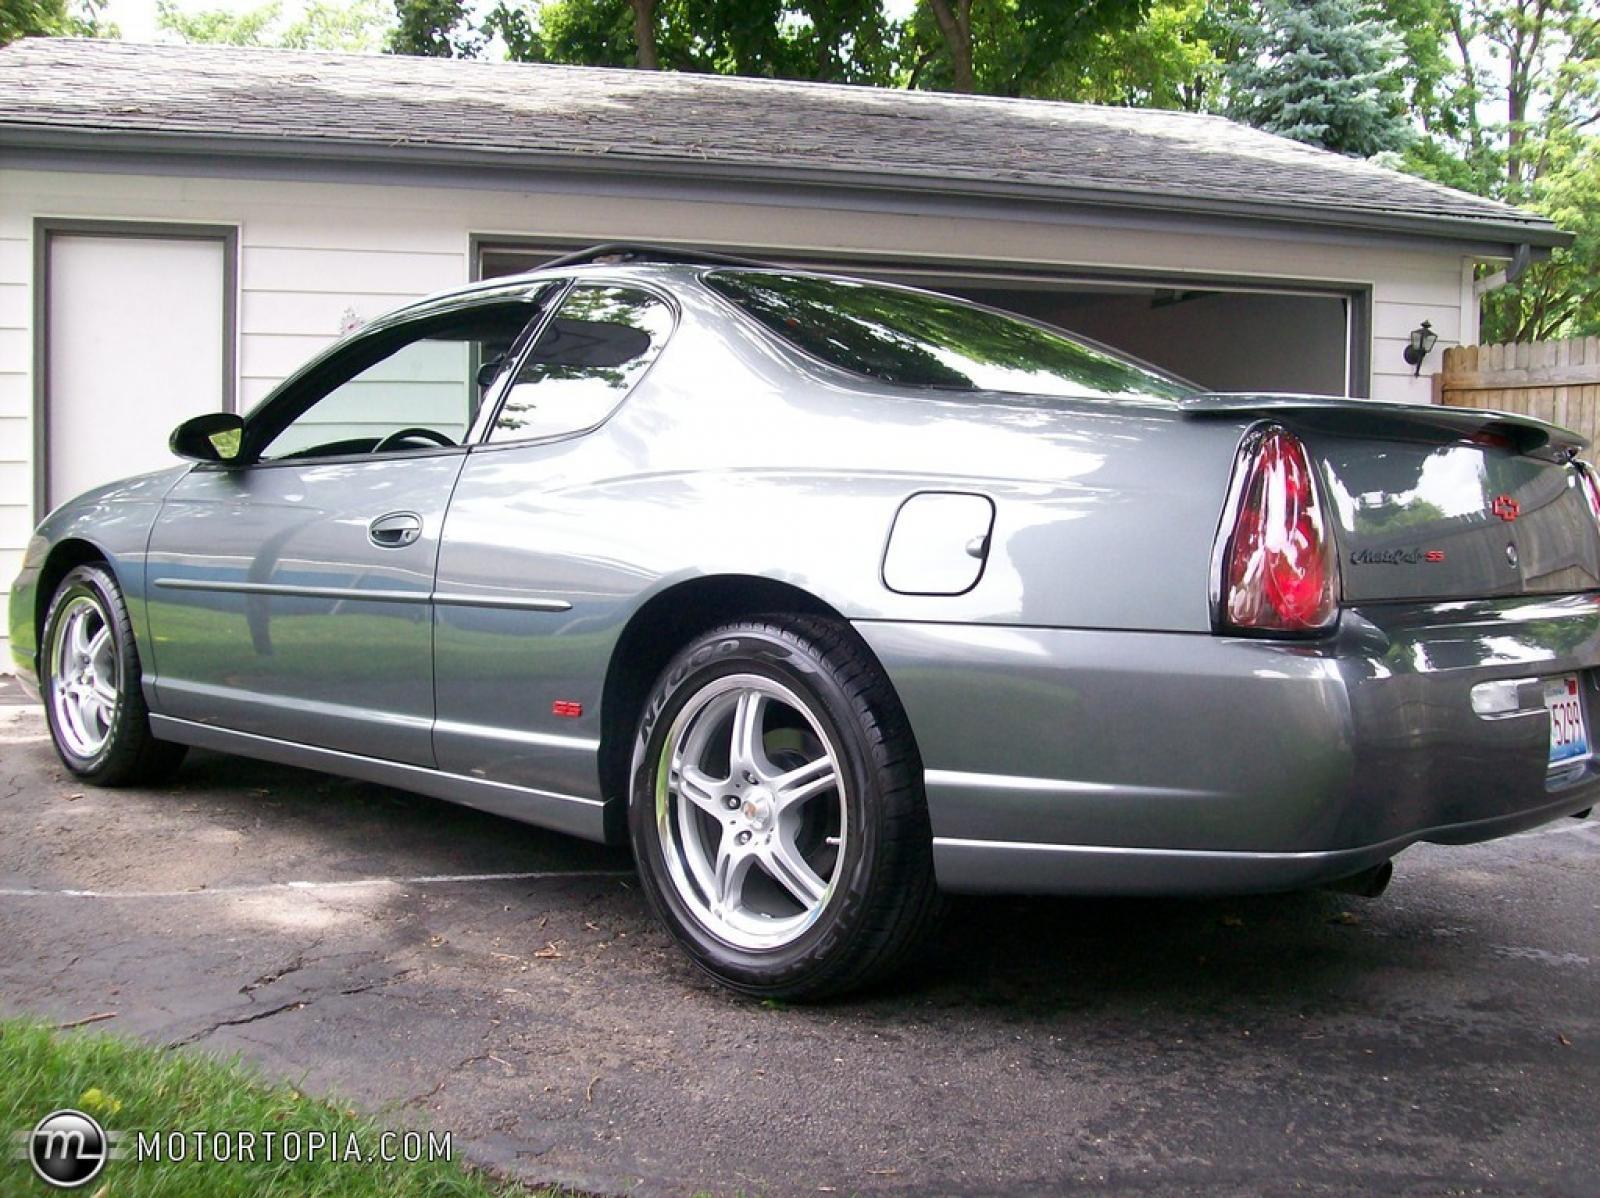 2004 Chevrolet Monte Carlo #6 Chevrolet Monte Carlo #6 800 1024 1280 1600  Origin ...